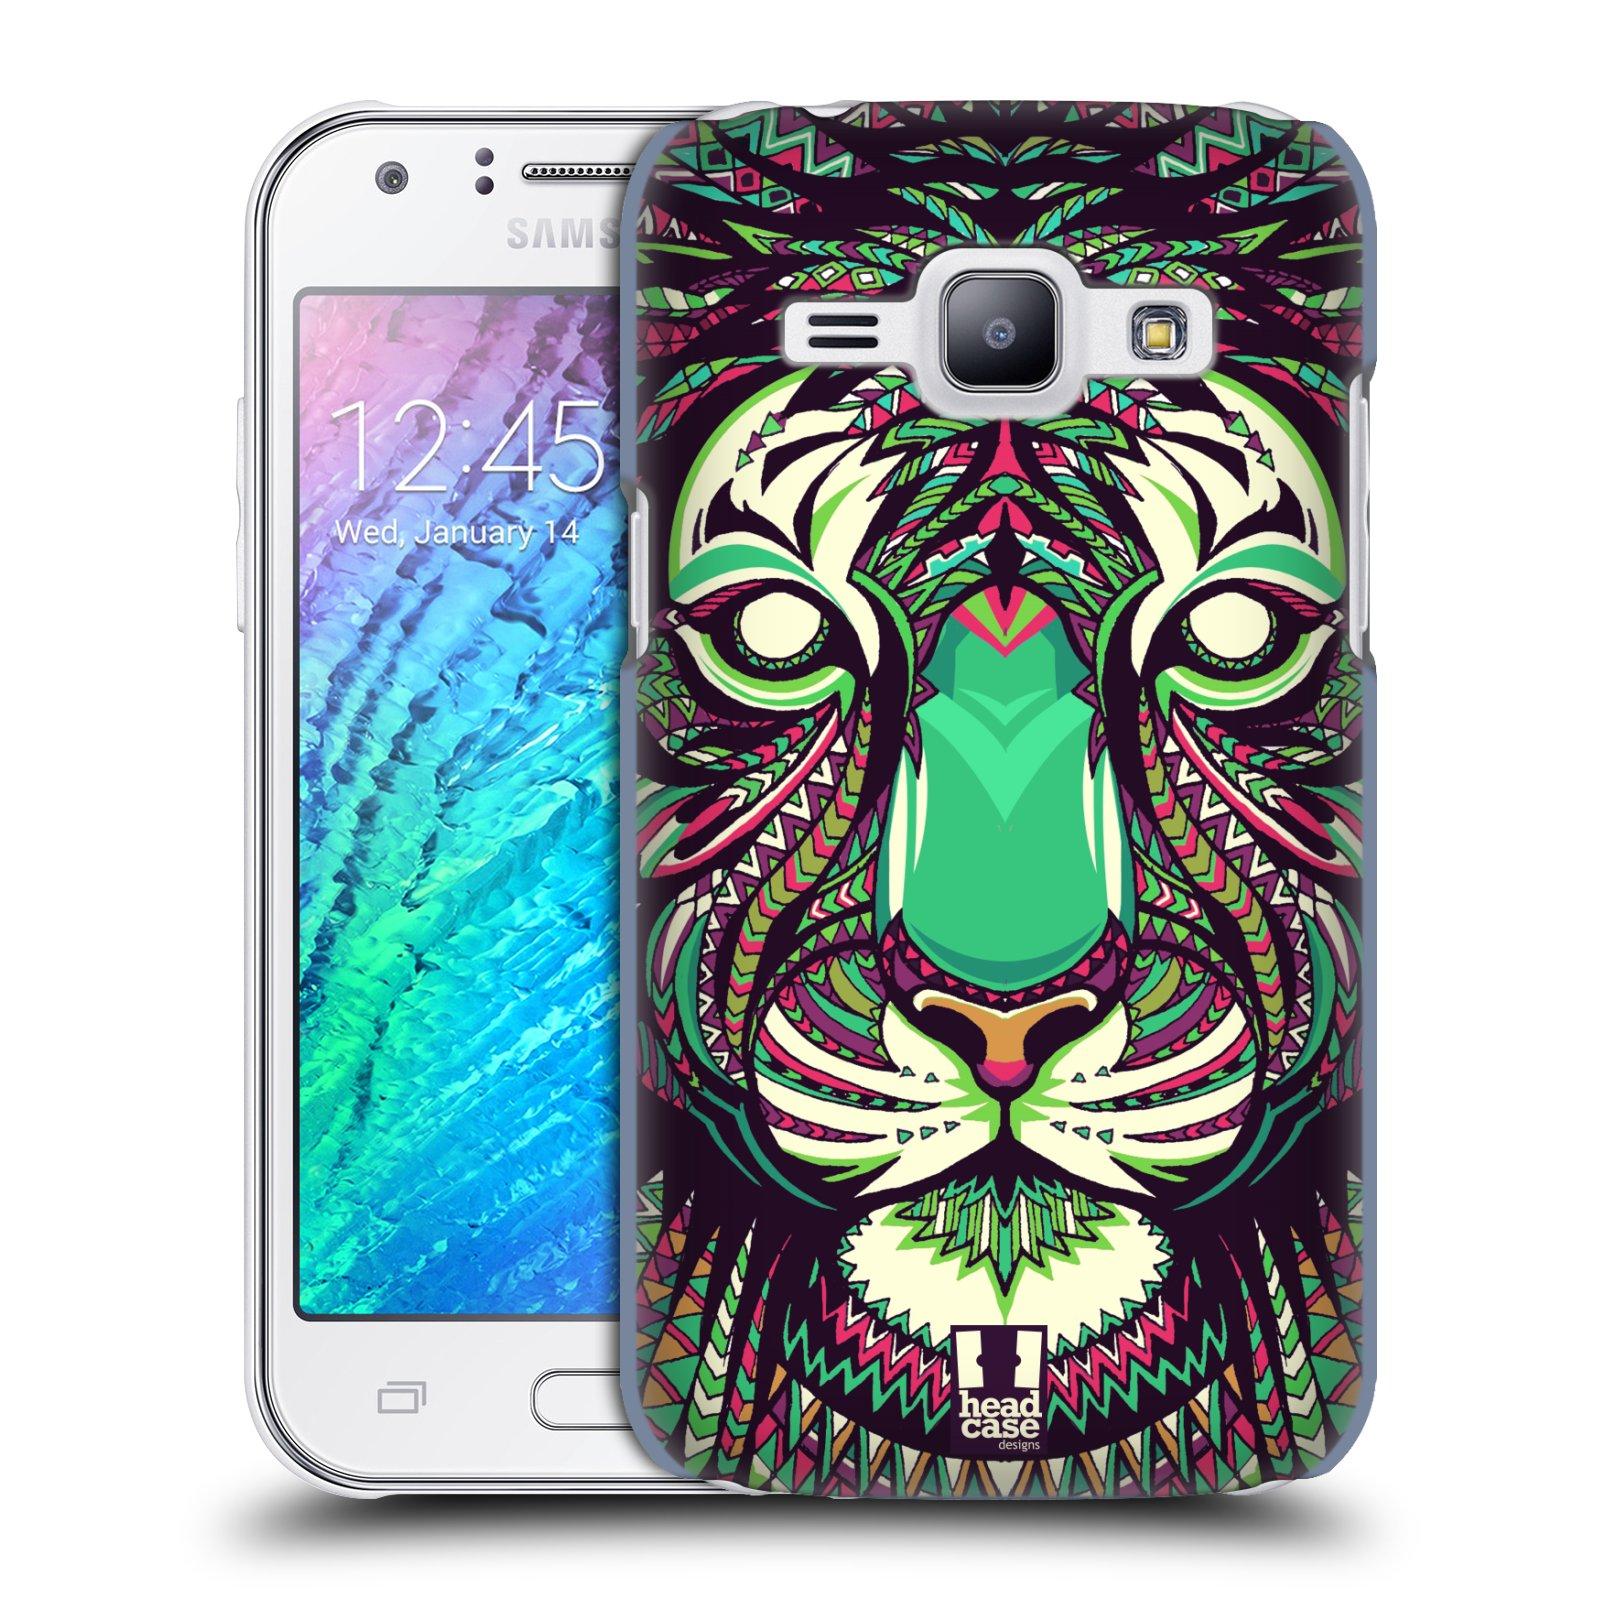 HEAD CASE plastový obal na mobil SAMSUNG Galaxy J1, J100 vzor Aztécký motiv zvíře 2 tygr